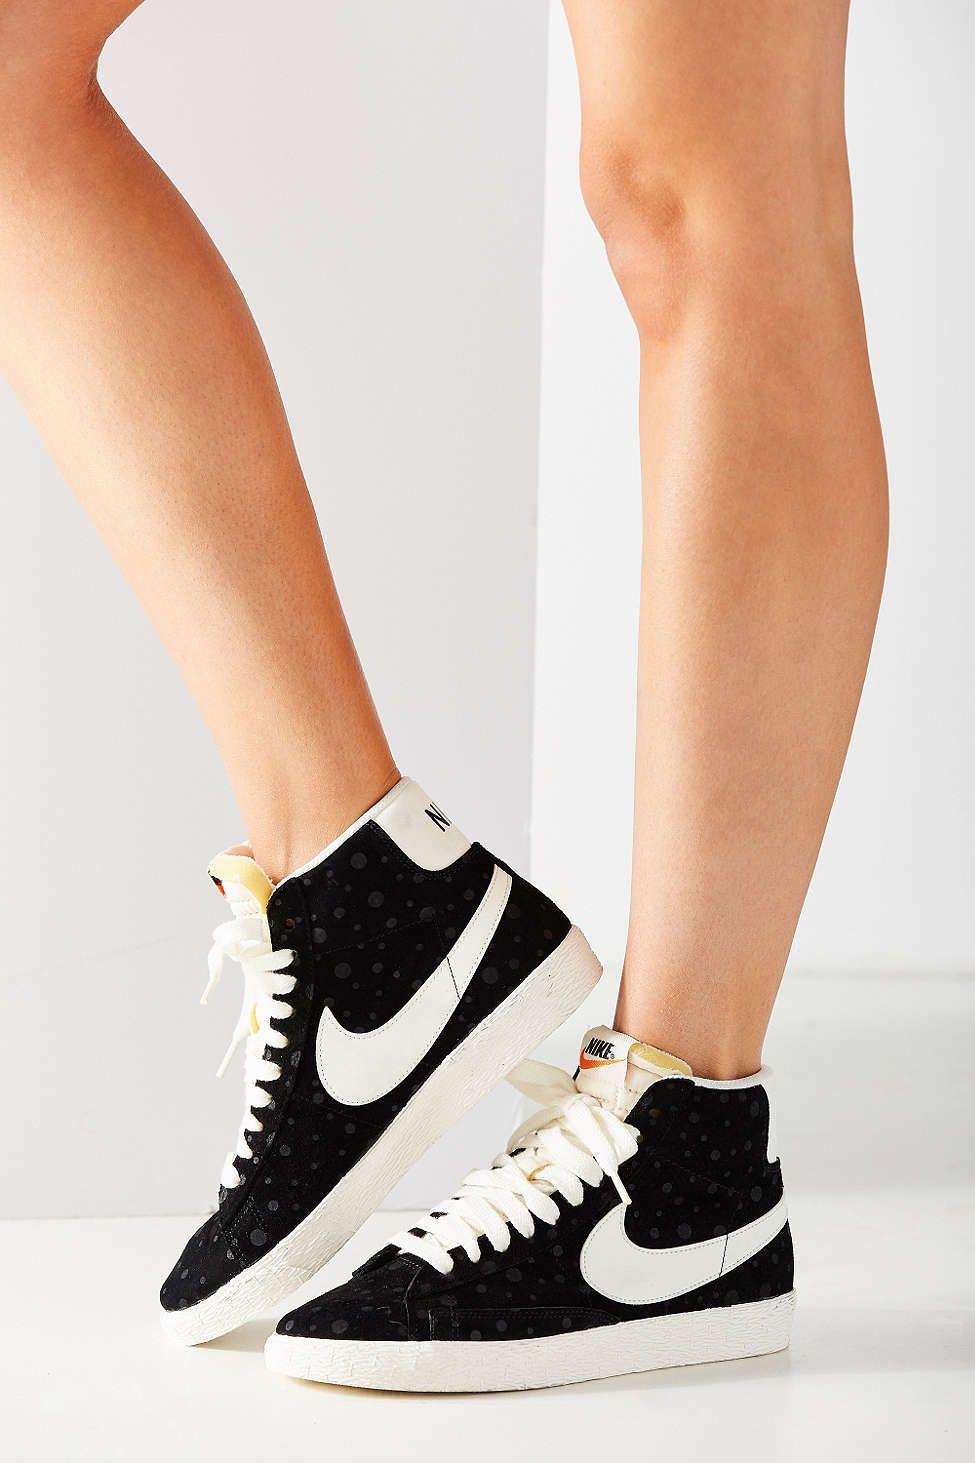 b17f0d60 Nike Women's Blazer Mid Suede Vintage Sneaker | Fashion Inspiration ...